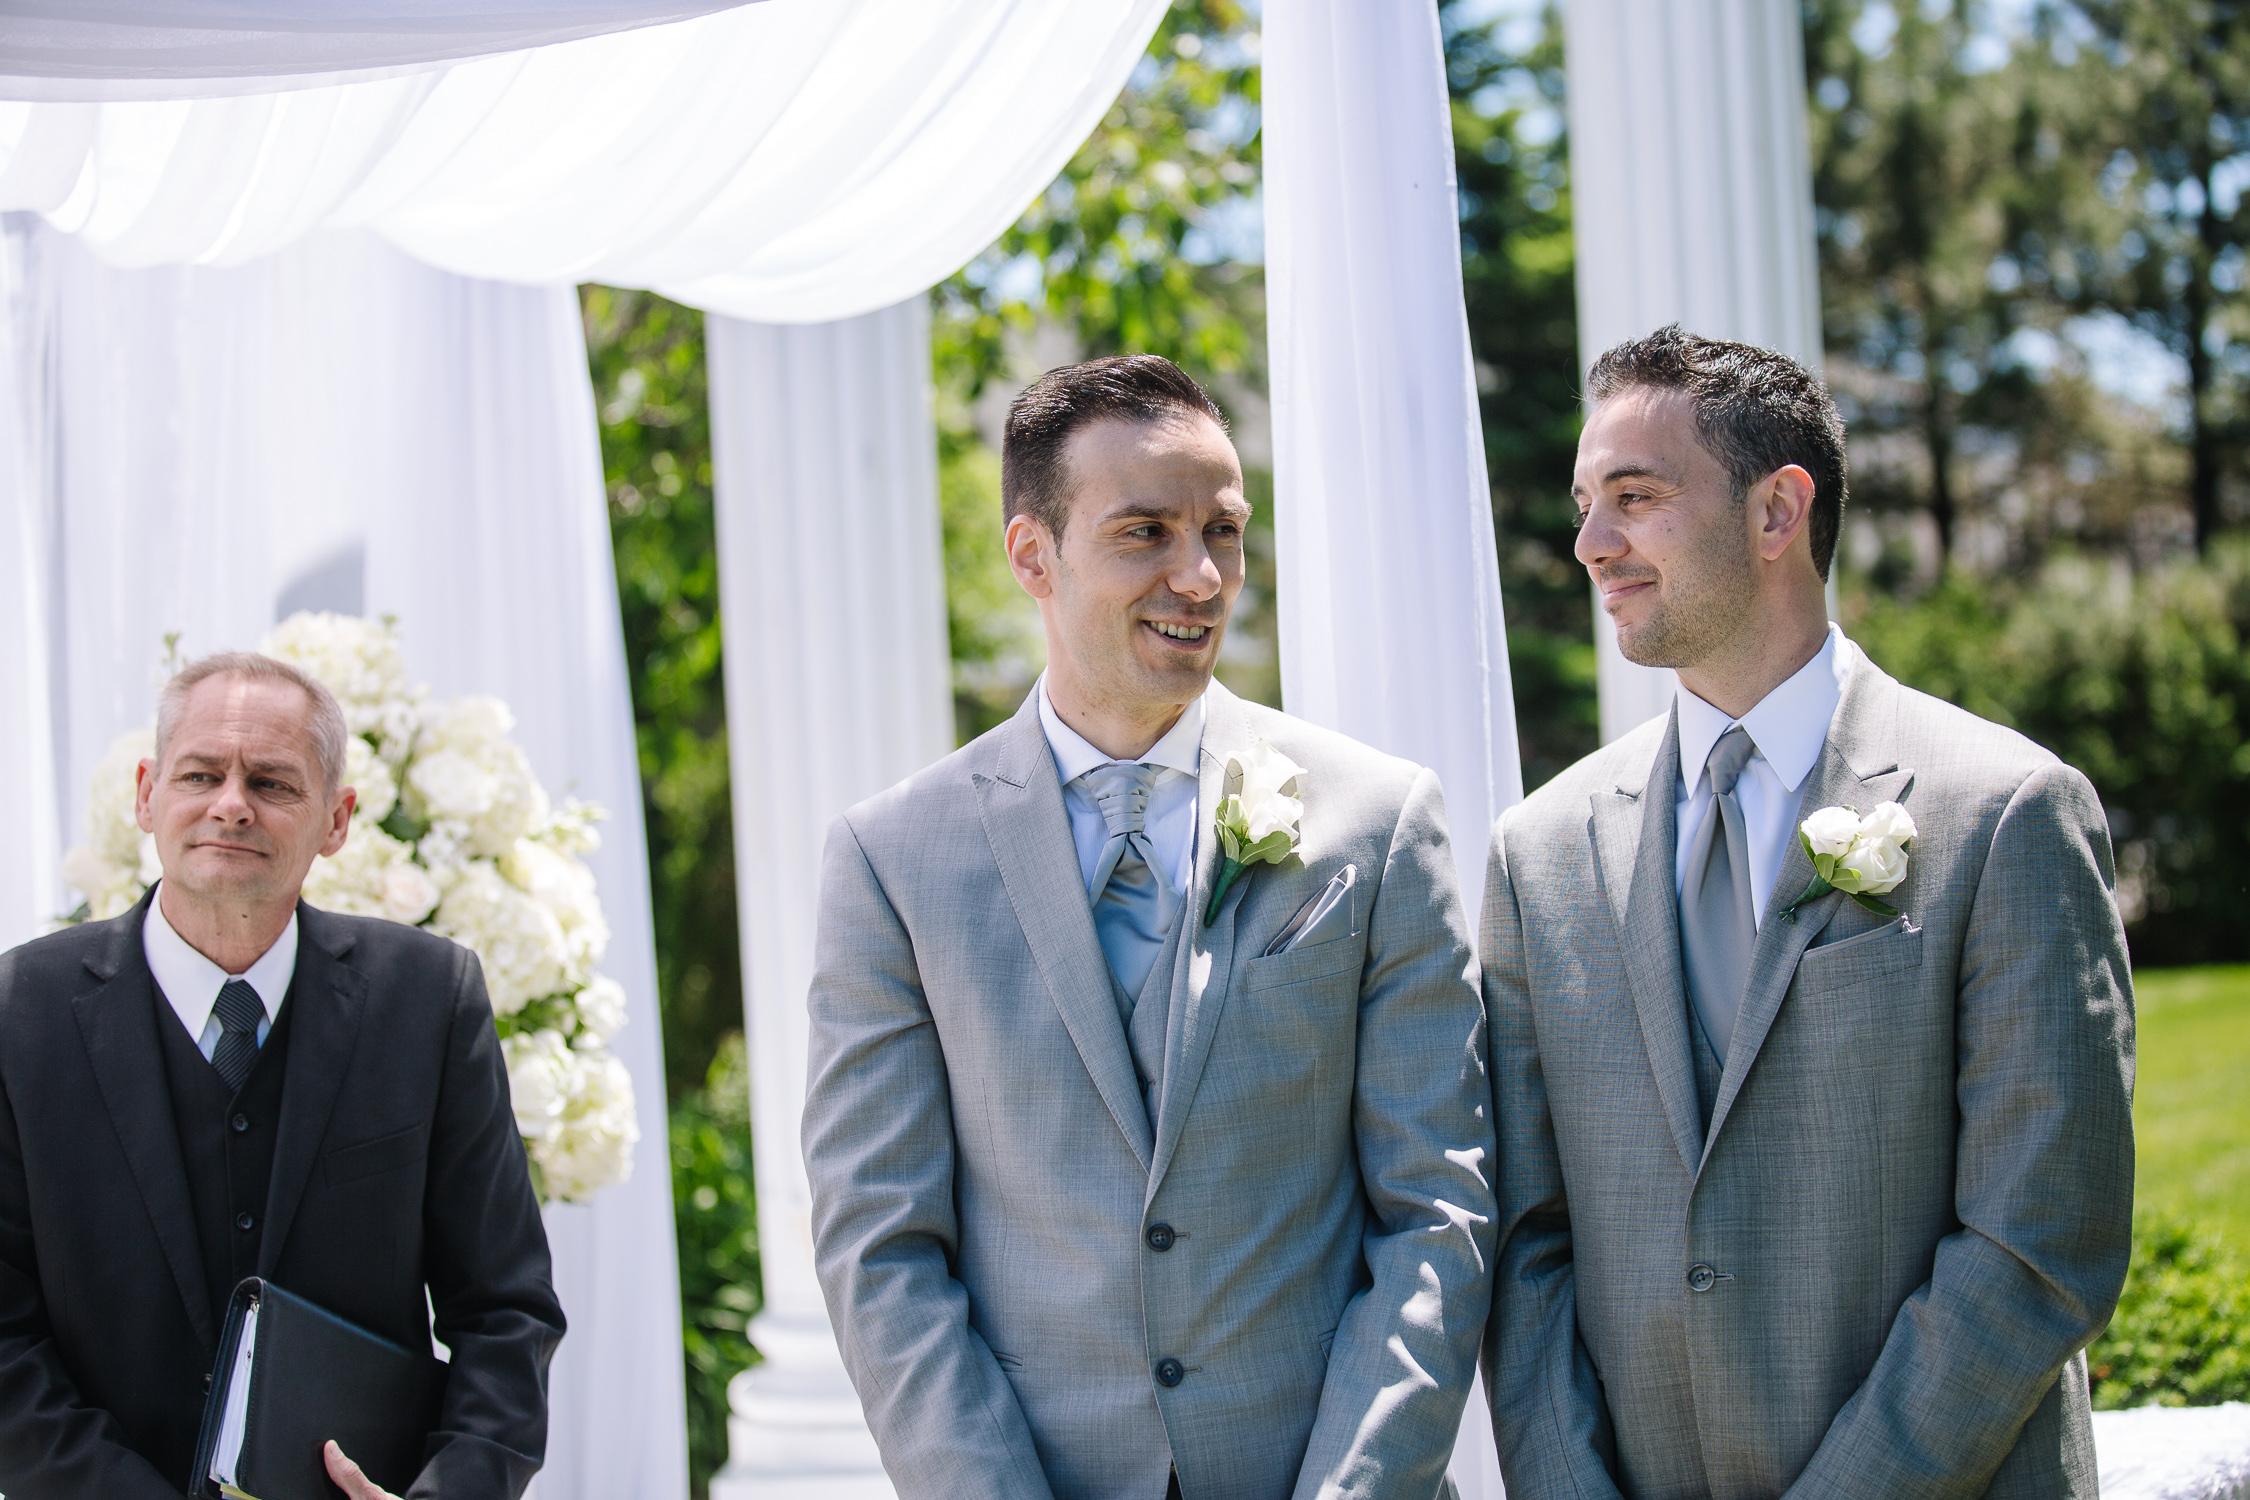 Paradise-Banquet-Hall-Wedding-Vaughan-Ontario-0034.jpg